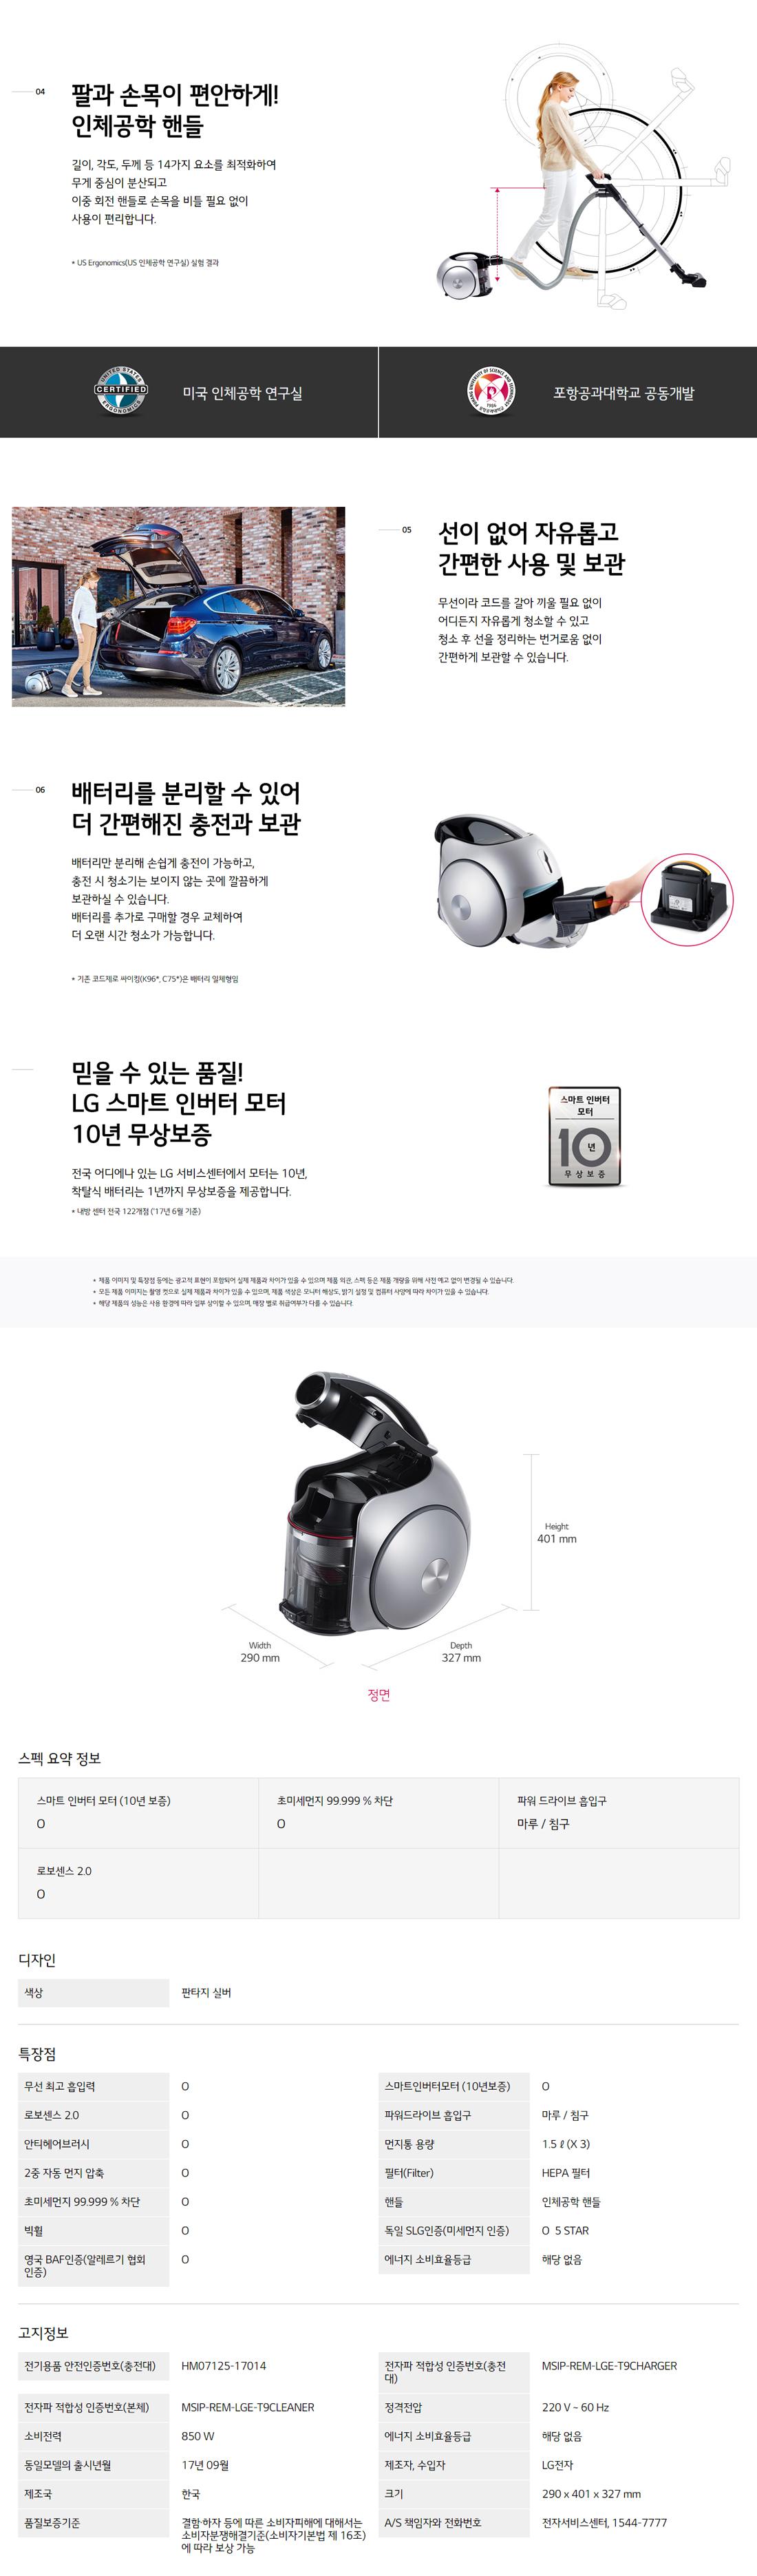 T950S_3.jpg